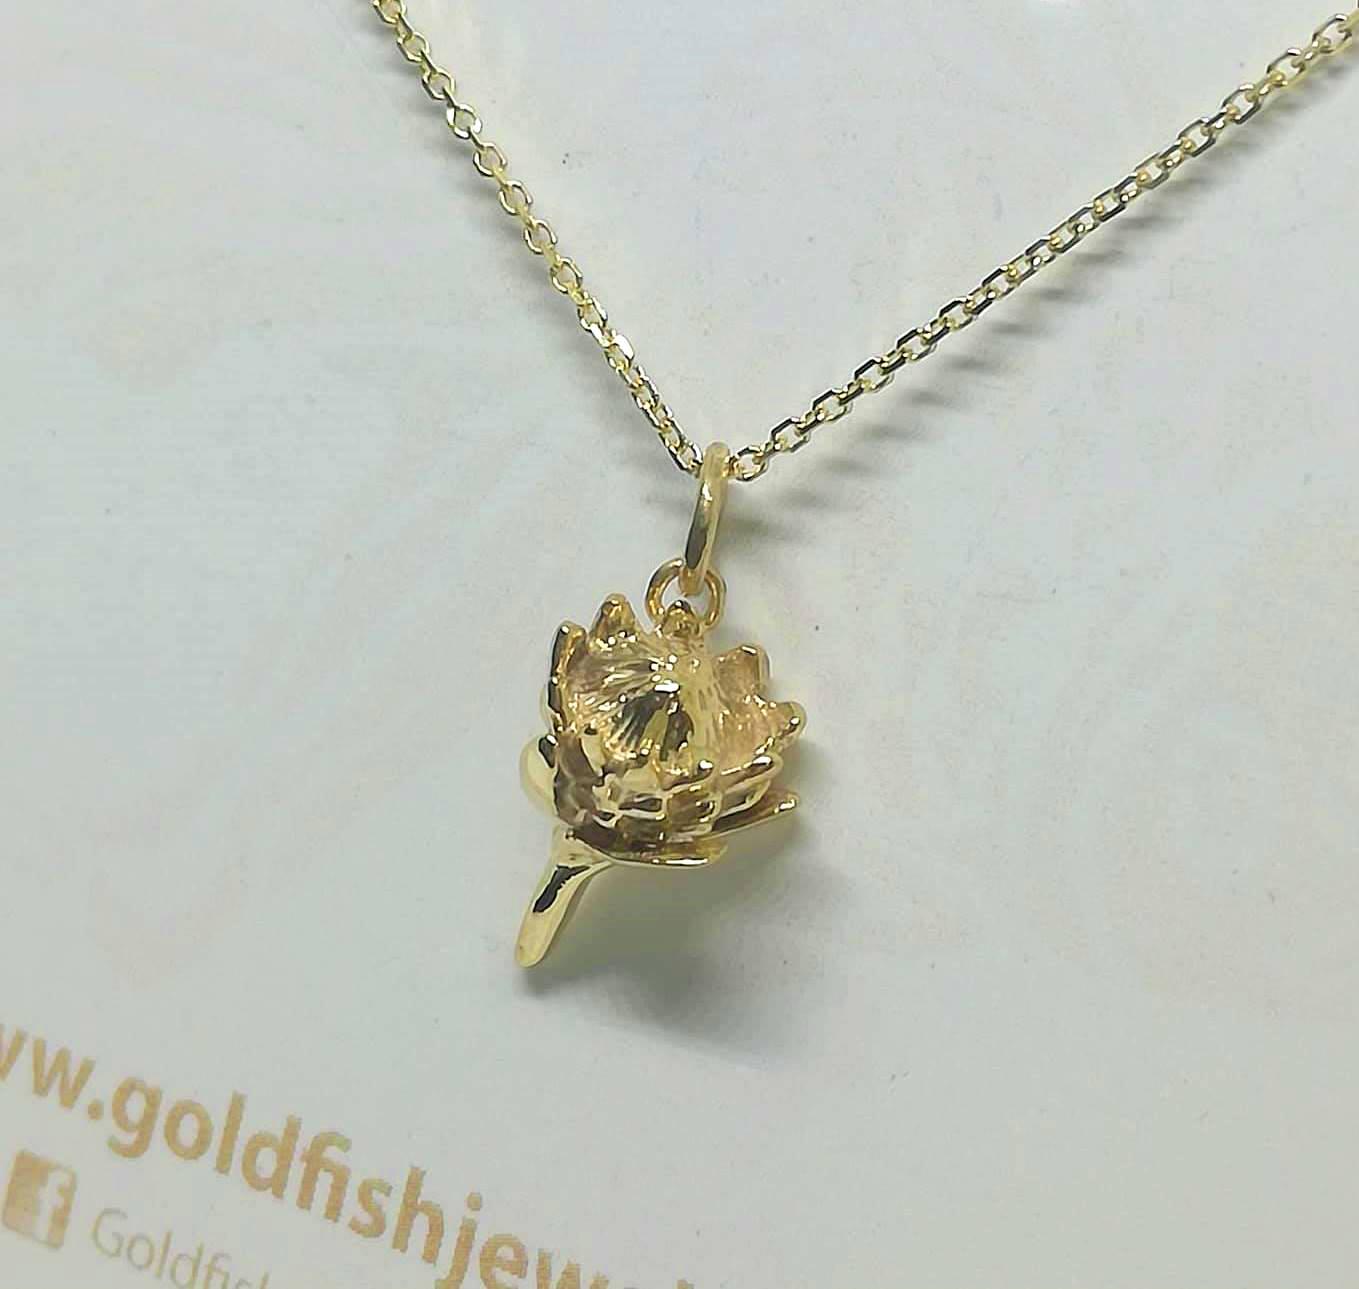 9ct Yellow Gold Small Protea Pendant | Goldfish Jewellery Design ...